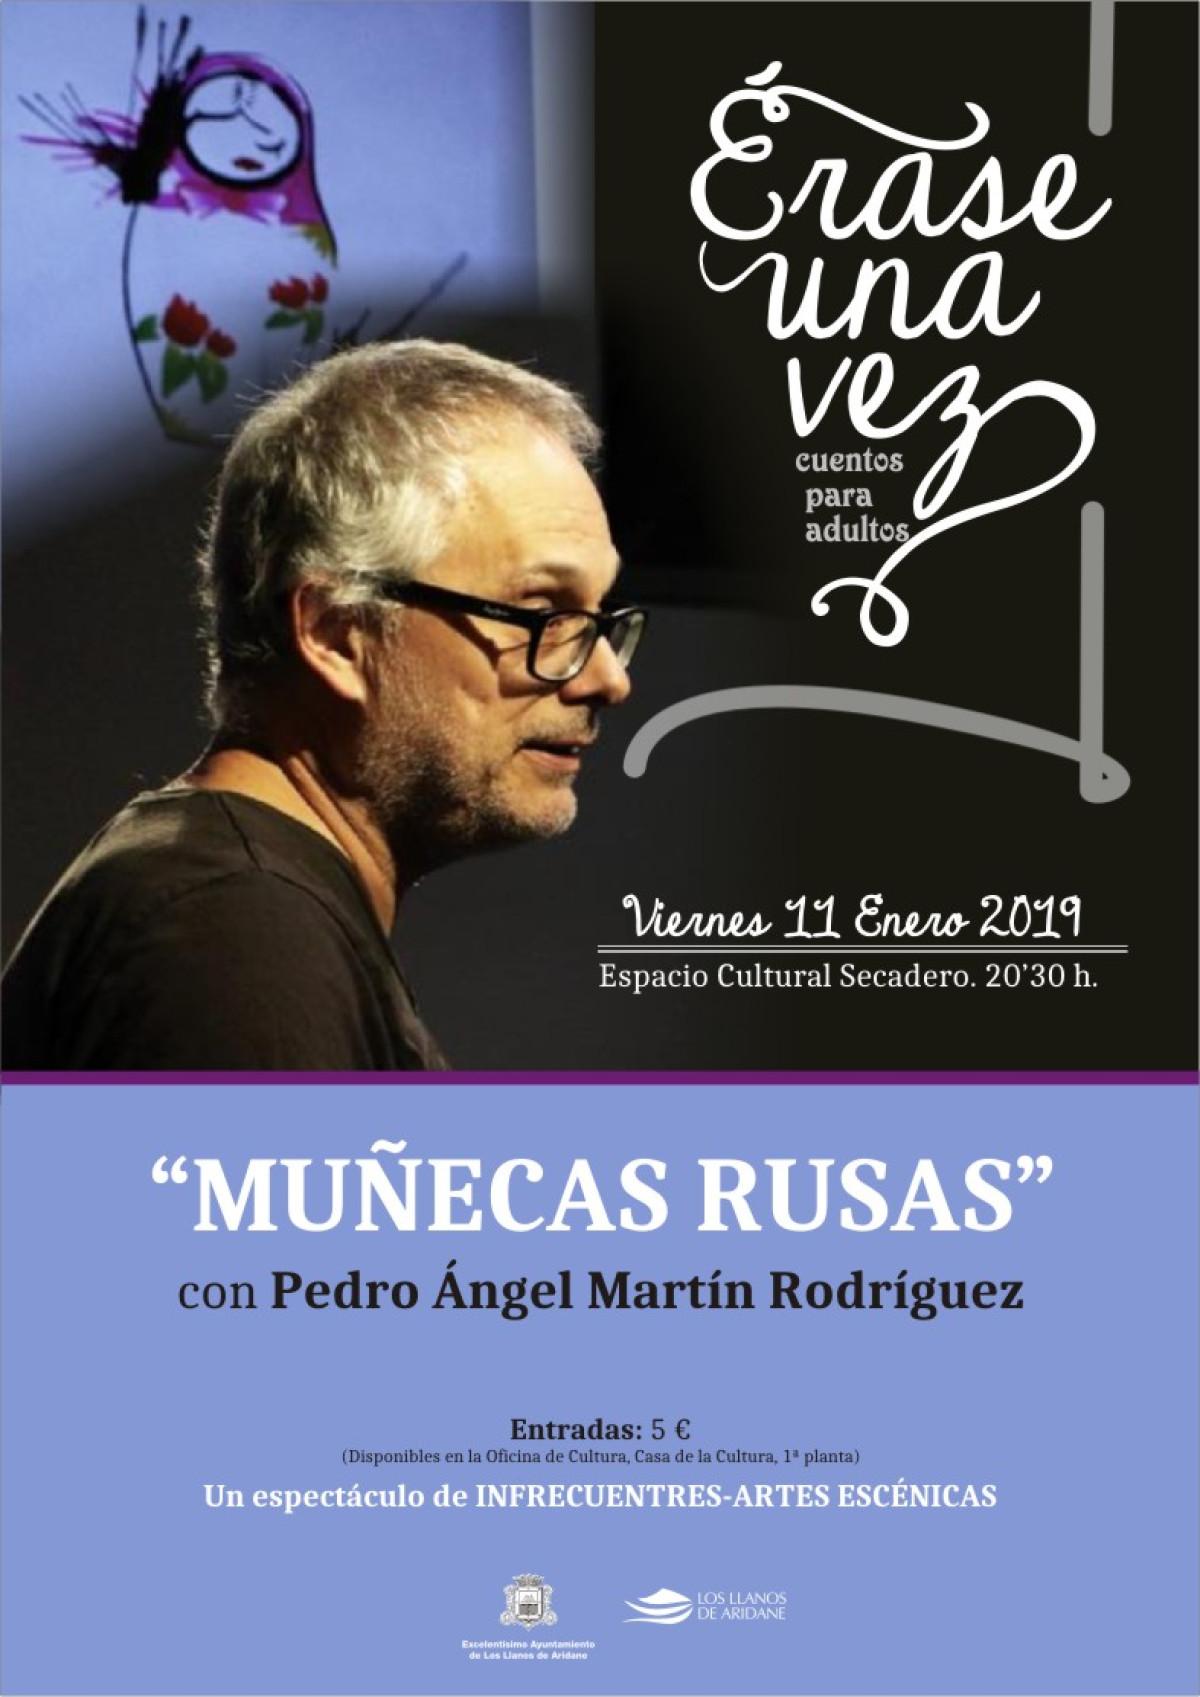 Ndp cartel estreno Eraseunavez 2019